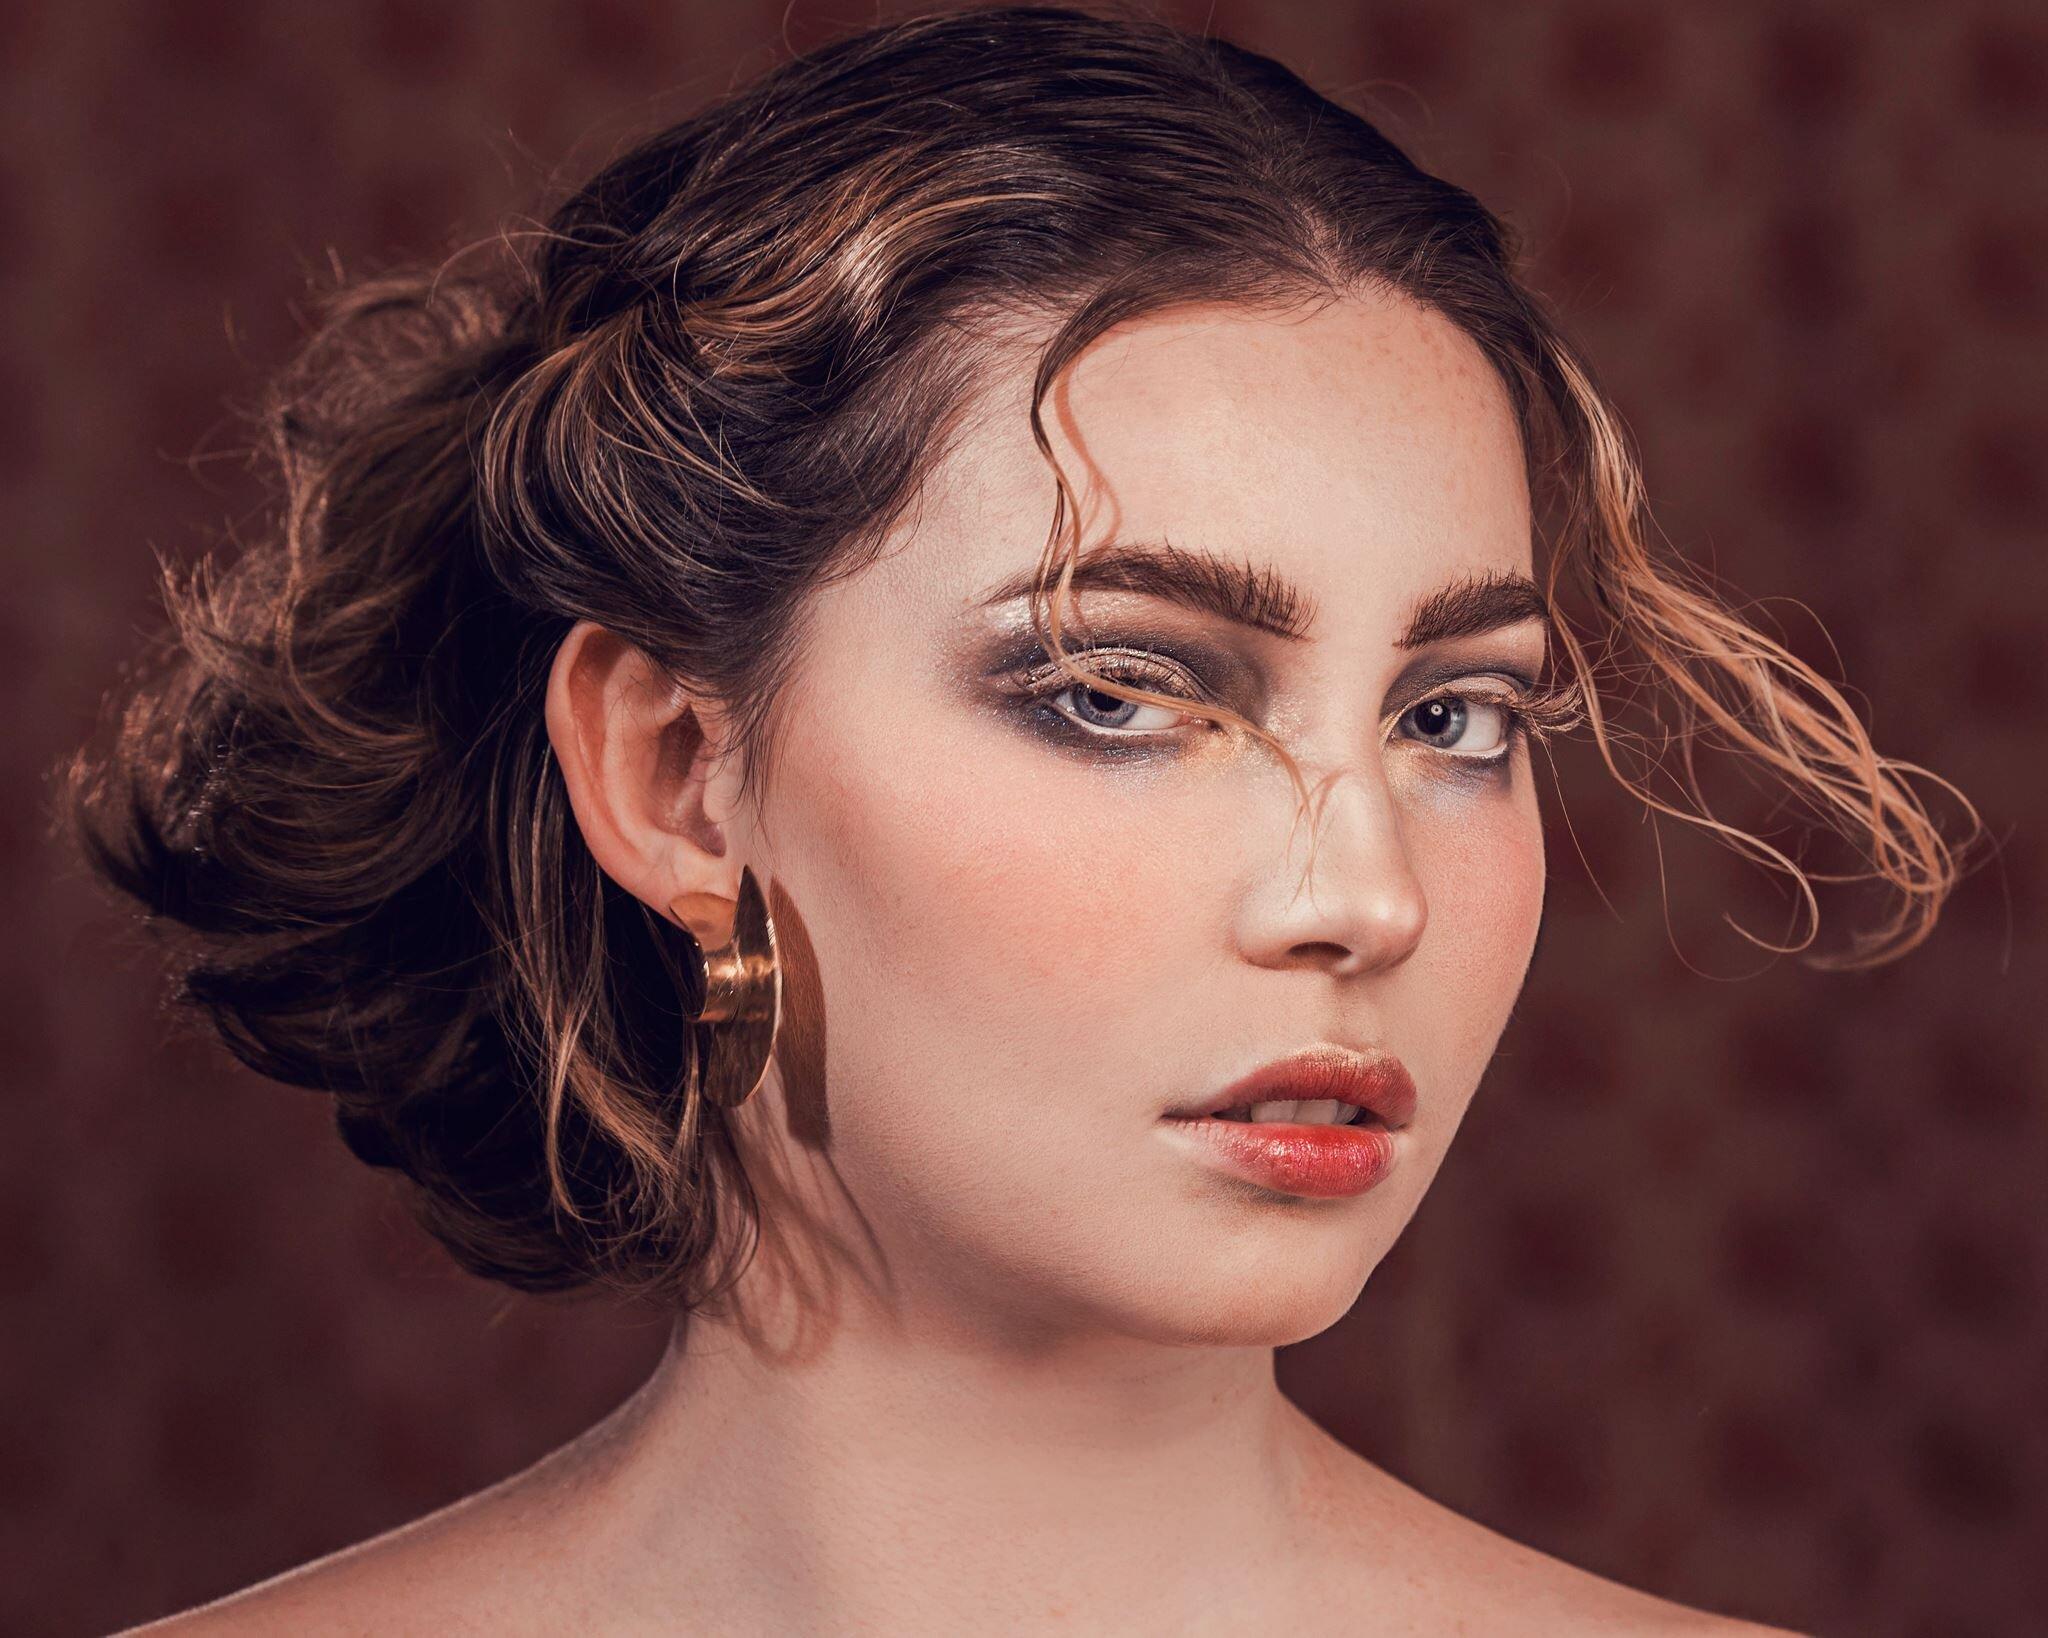 Photographer: Bernadette Newberry  Model: Alexis Fabish